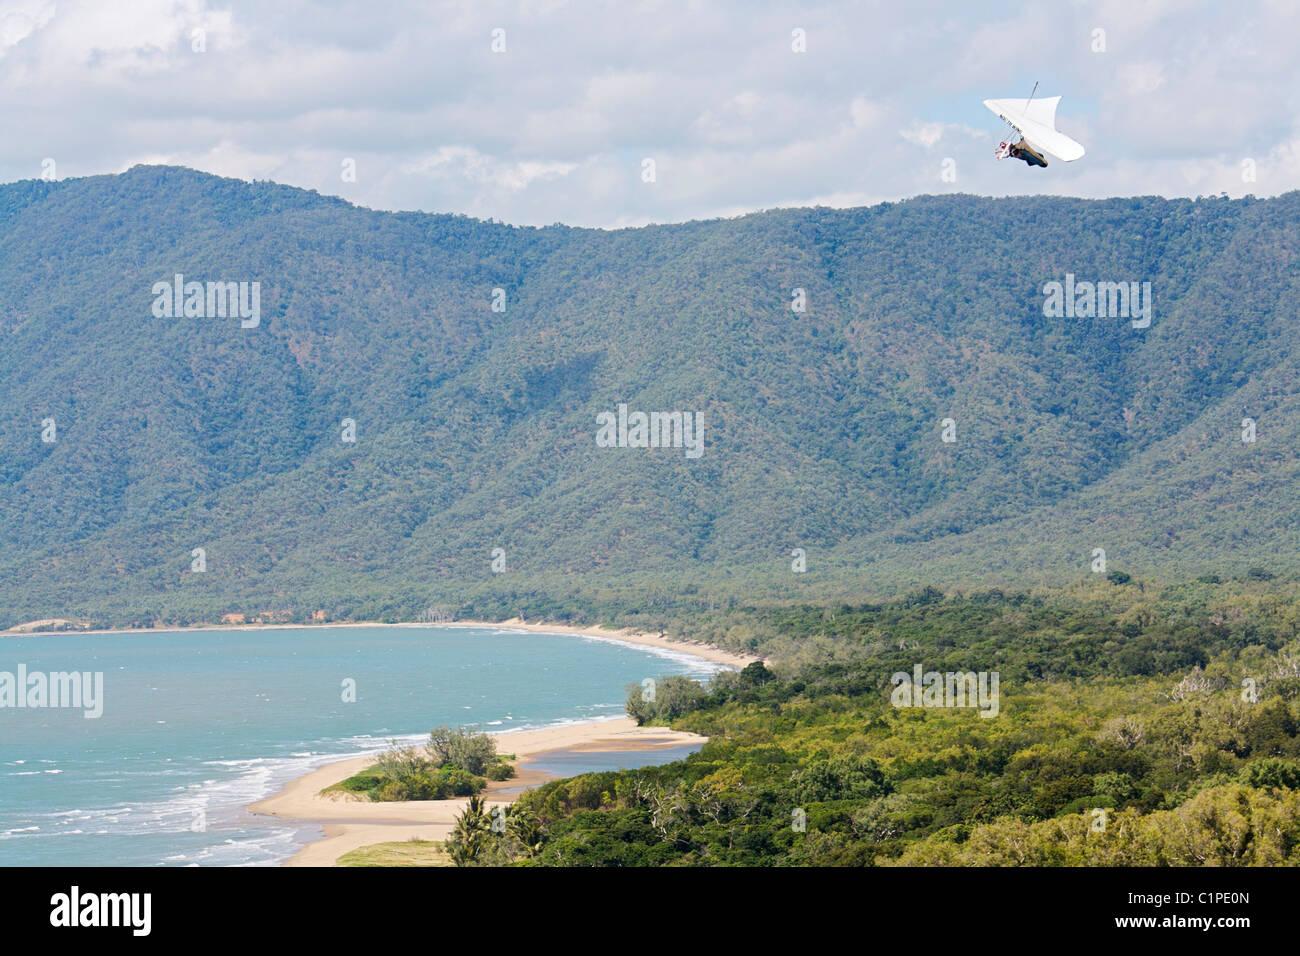 Australia, North Queensland, hang gliding above coastline - Stock Image